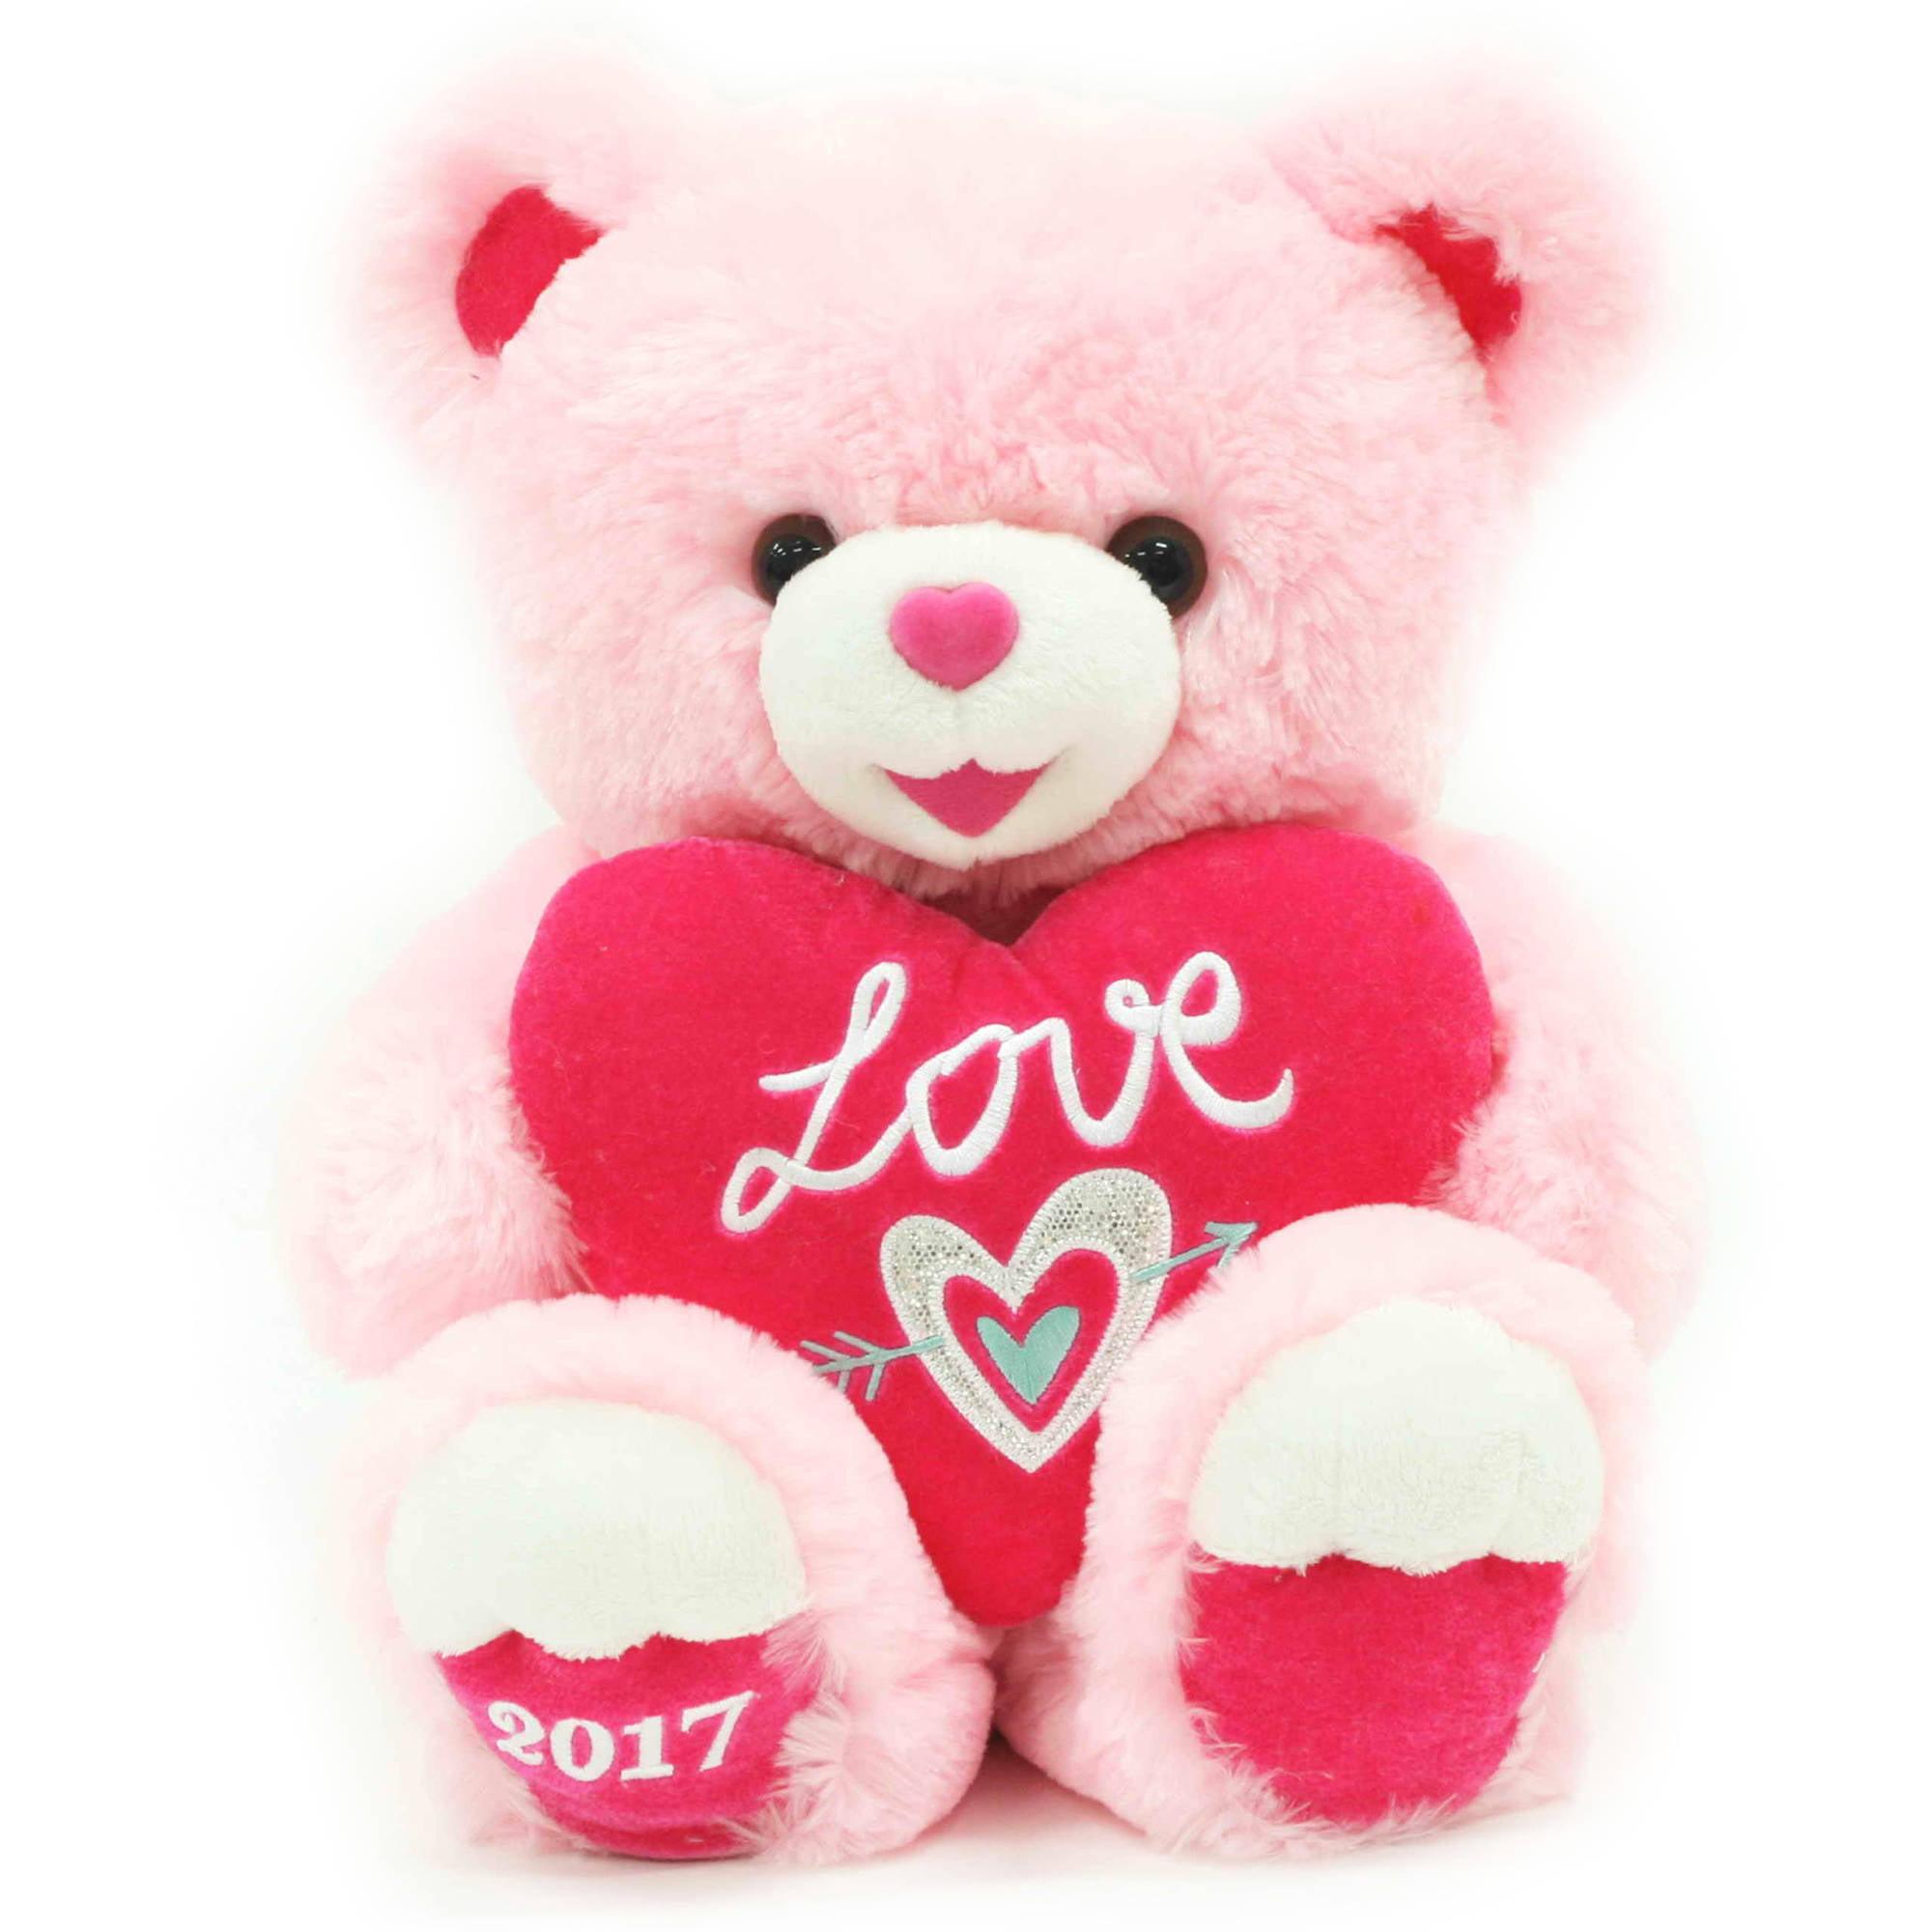 Baby Net For Stuffed Animals, Valentine Sweetheart Teddy Bear 14 Pink Walmart Com Walmart Com